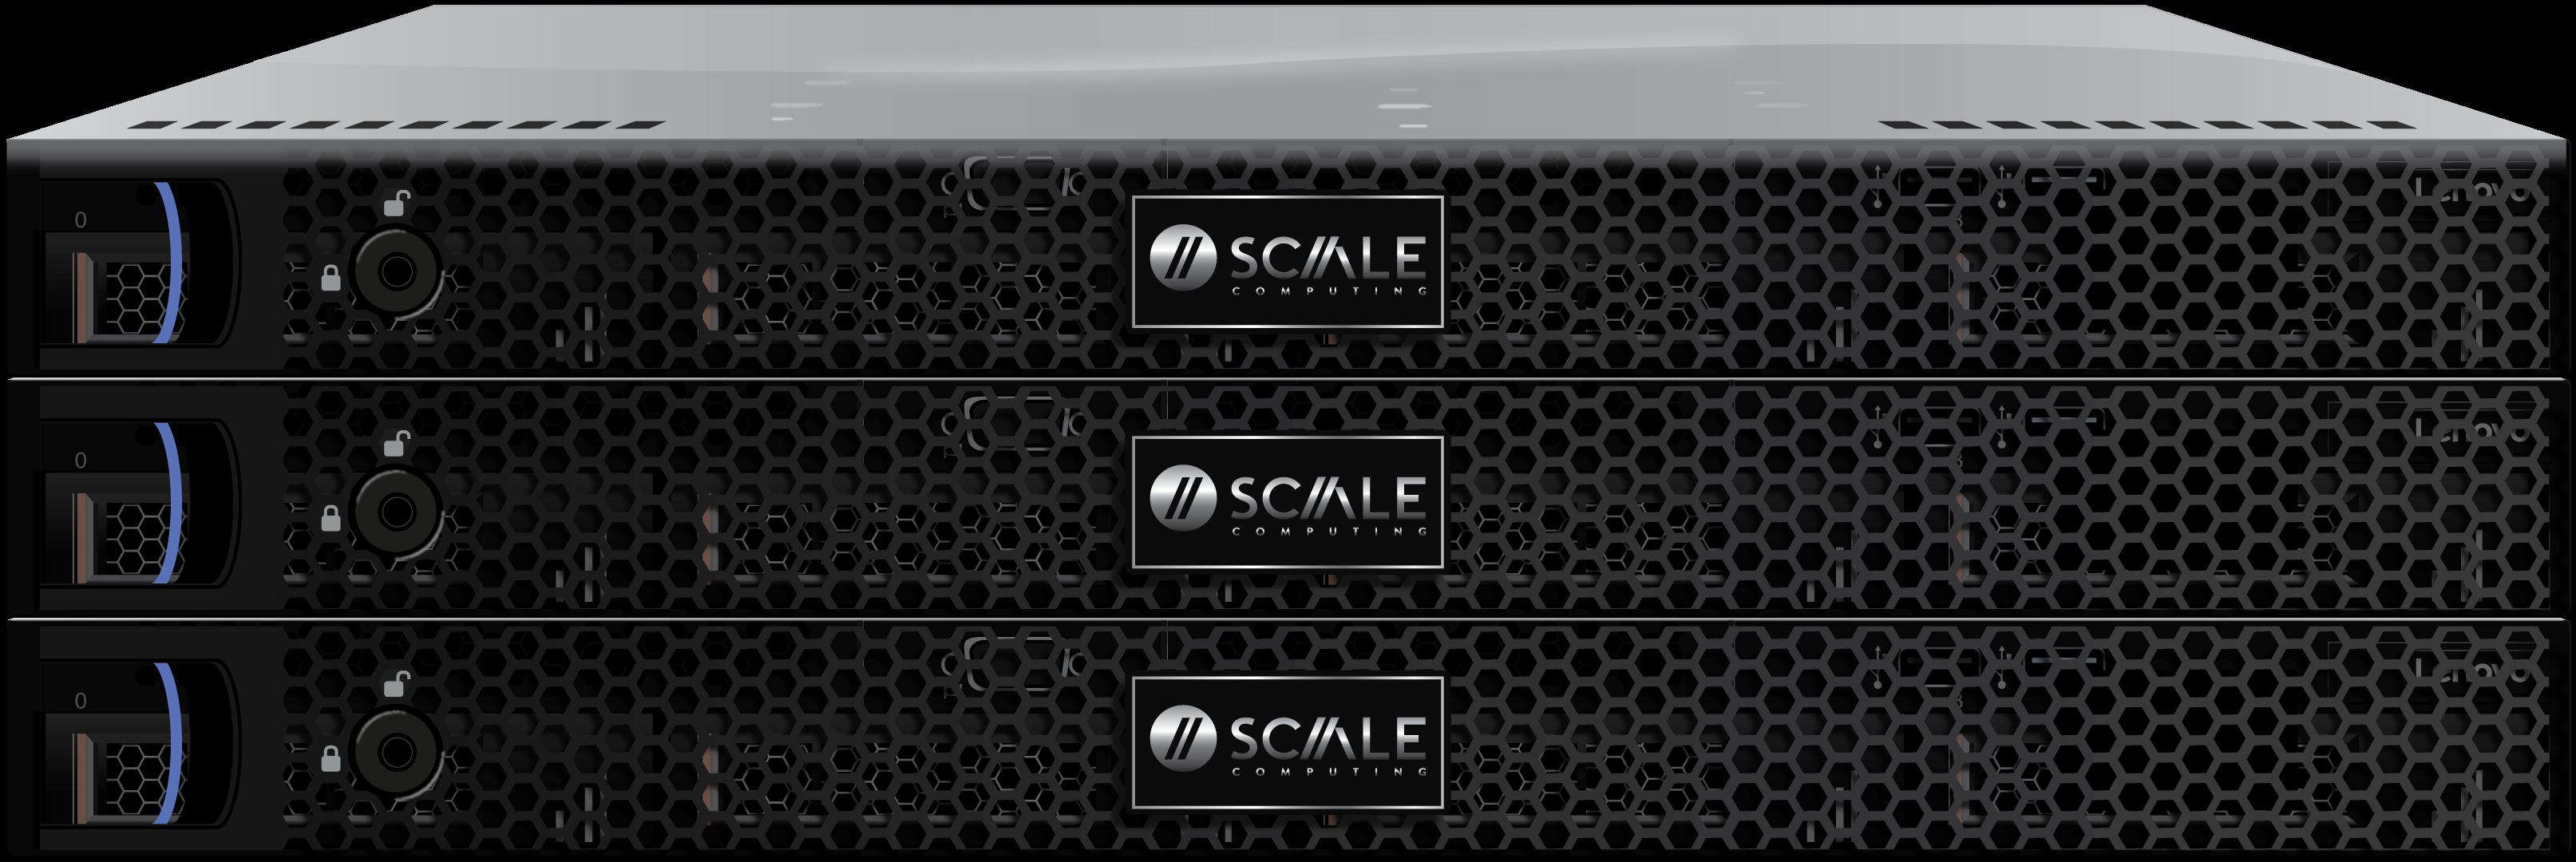 Scale Computing HC325df